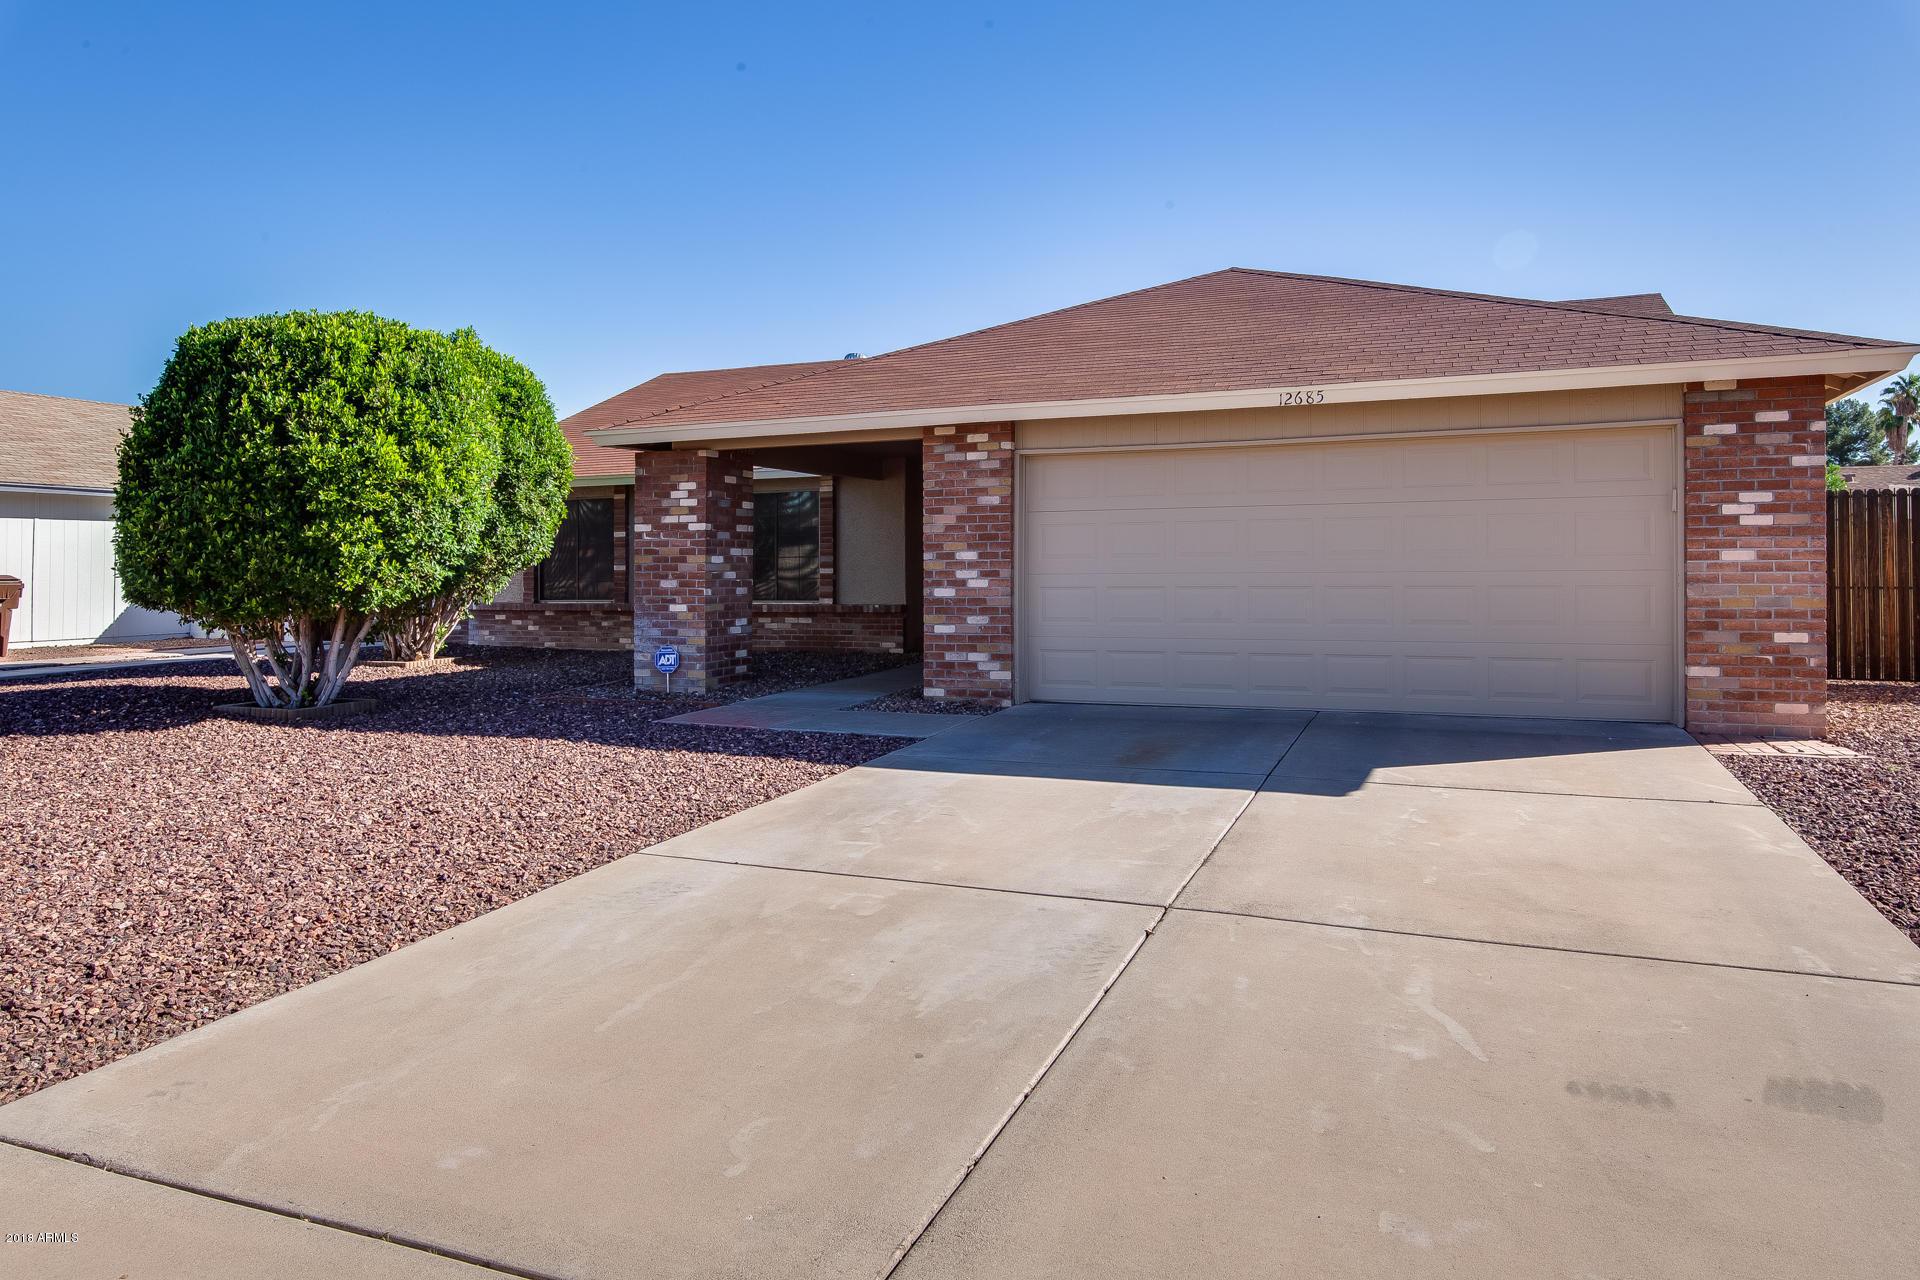 Photo of 12685 N 79TH Drive, Peoria, AZ 85381